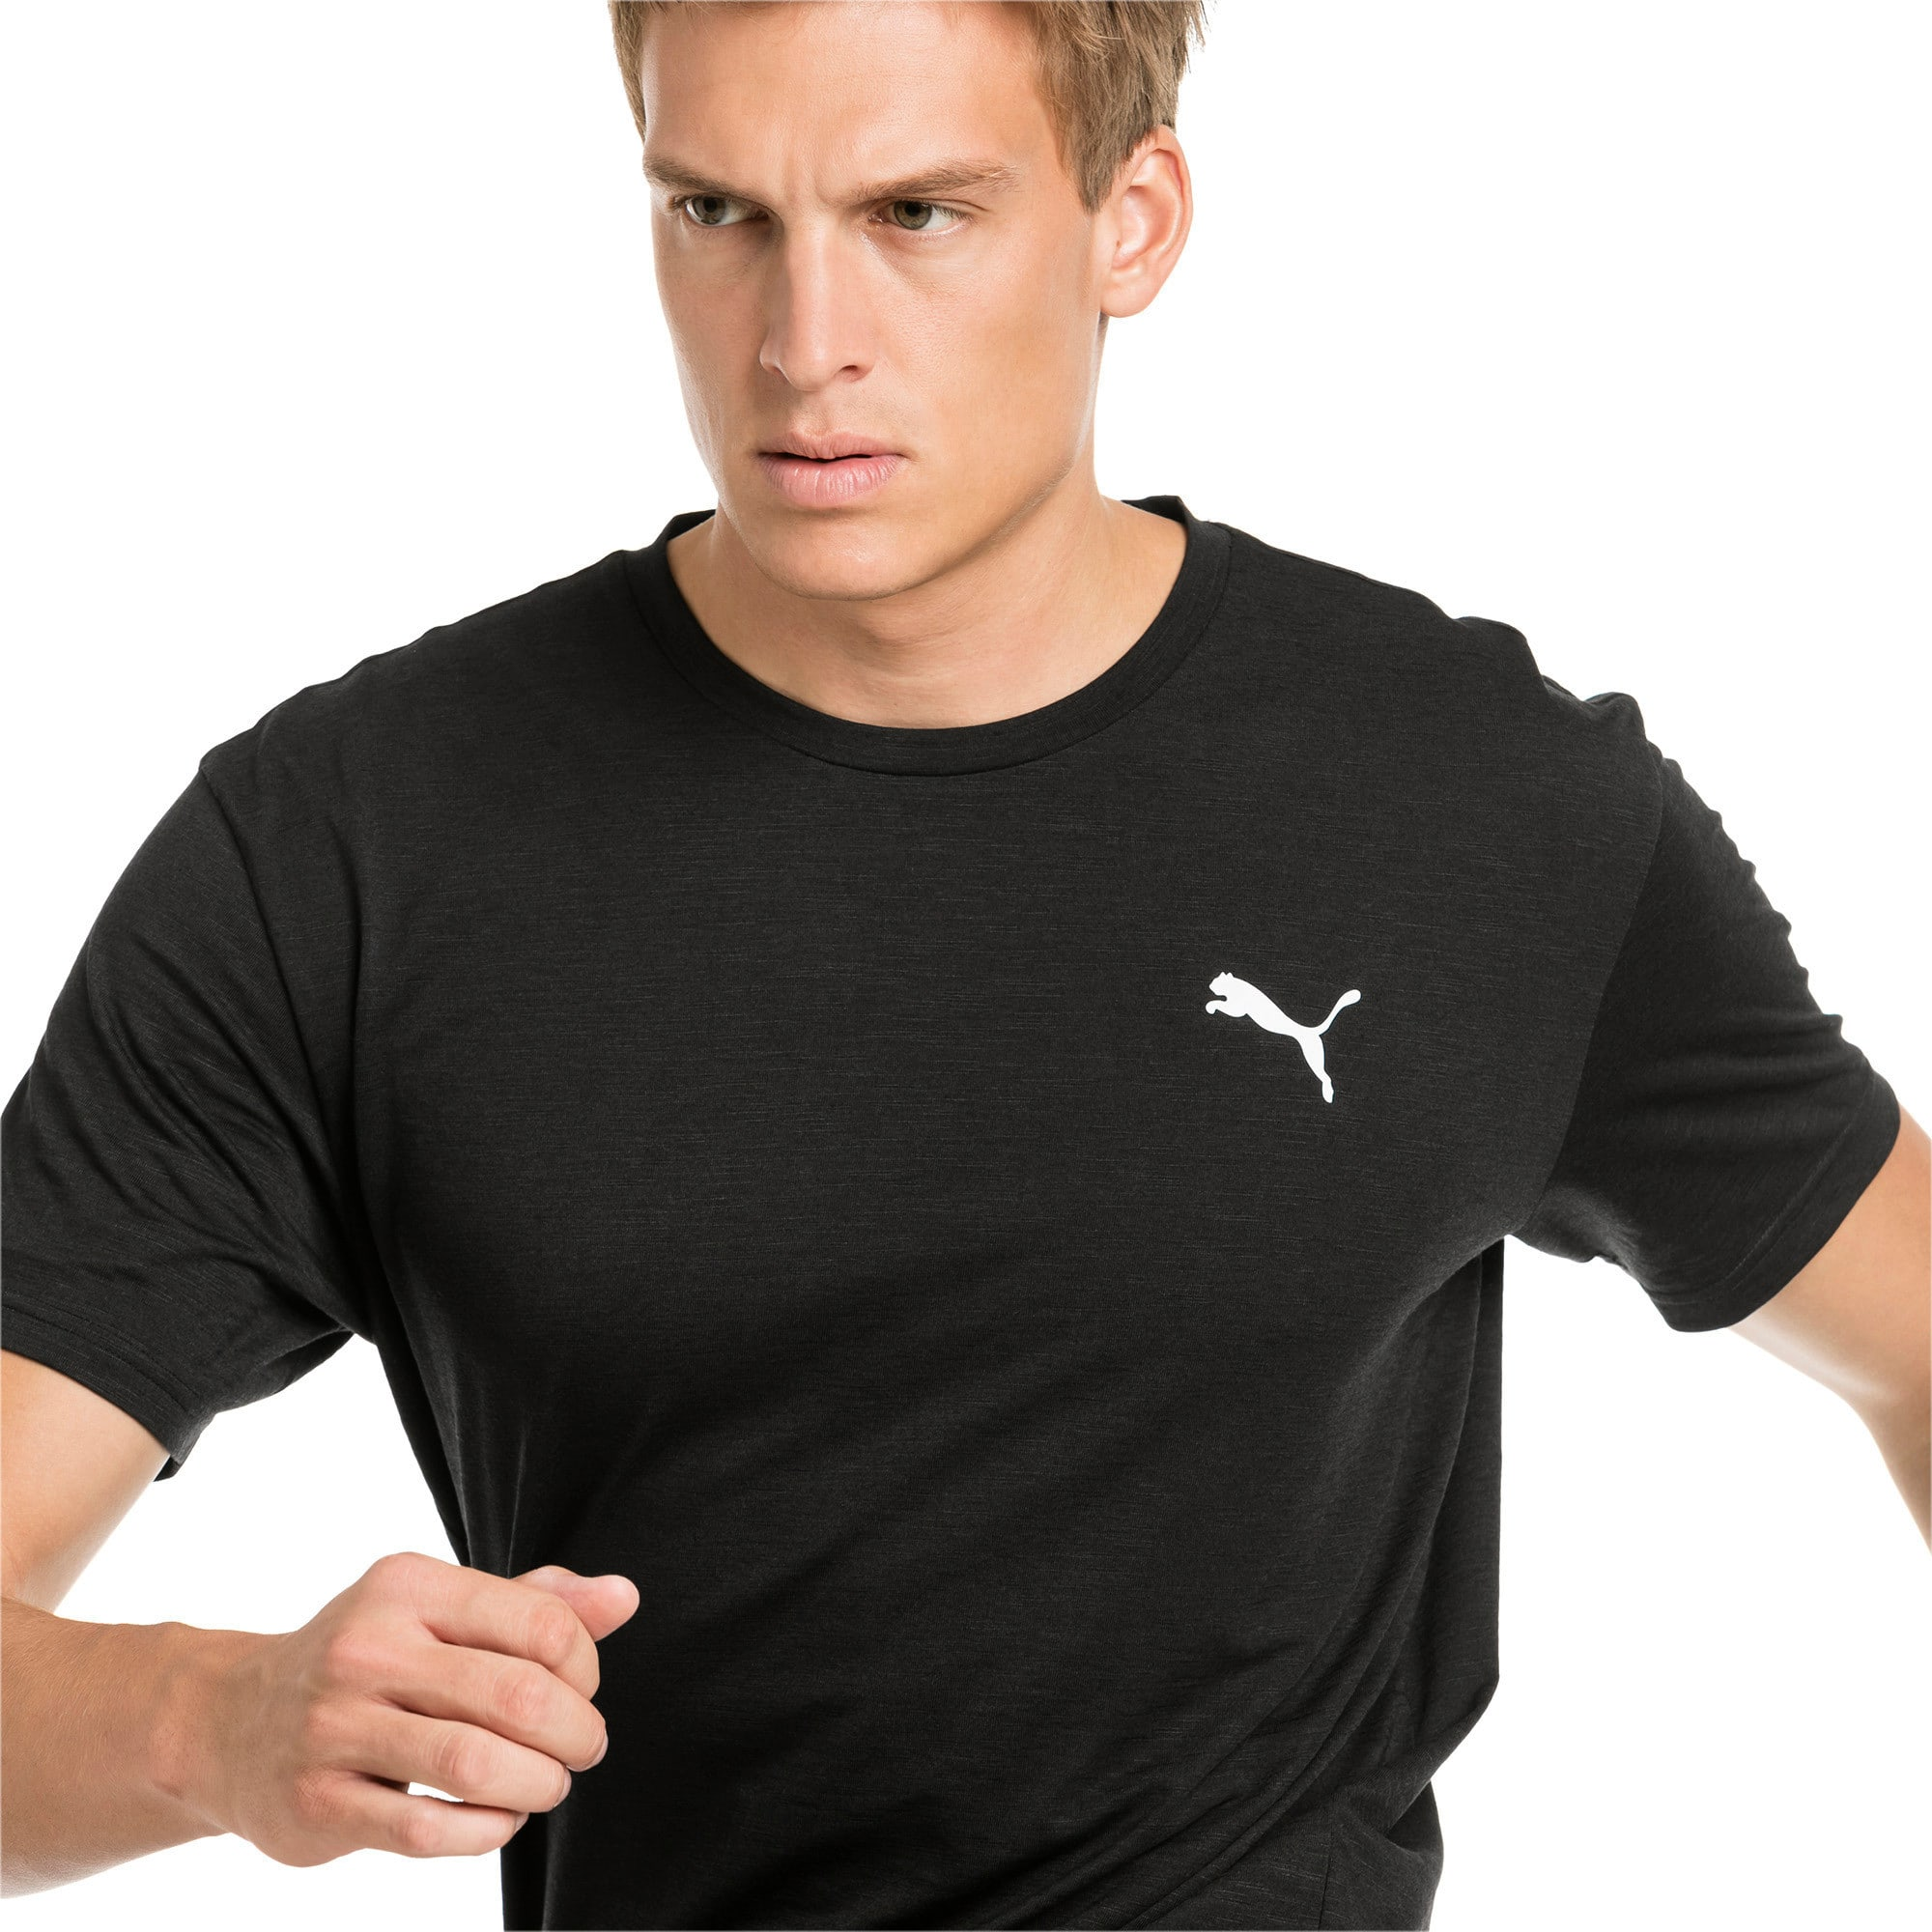 Thumbnail 1 of Energy Herren Training T-Shirt, Puma Black Heather, medium